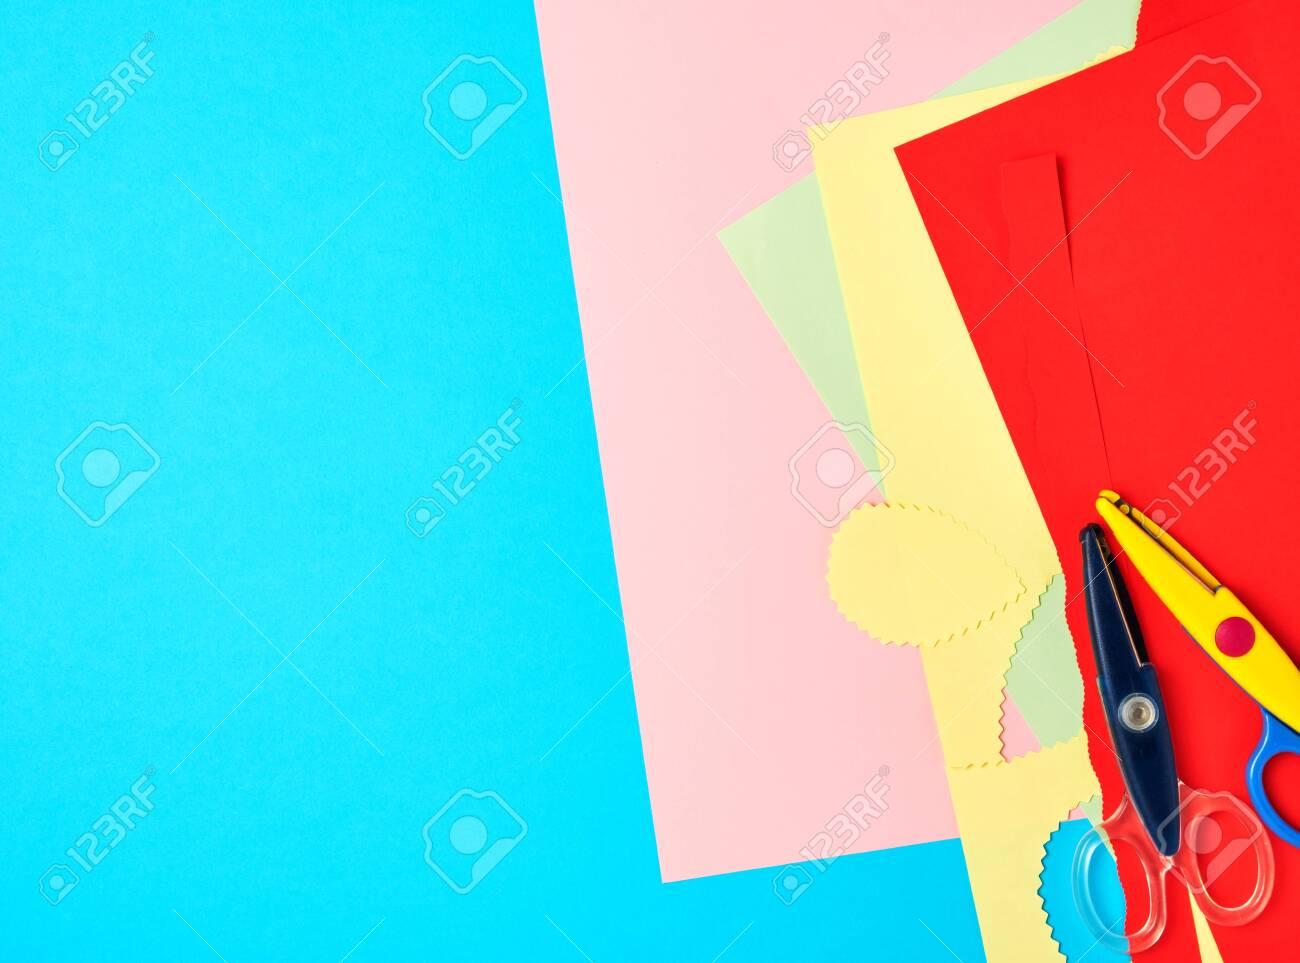 Cut Out Construction Paper Designs For Scrapbook